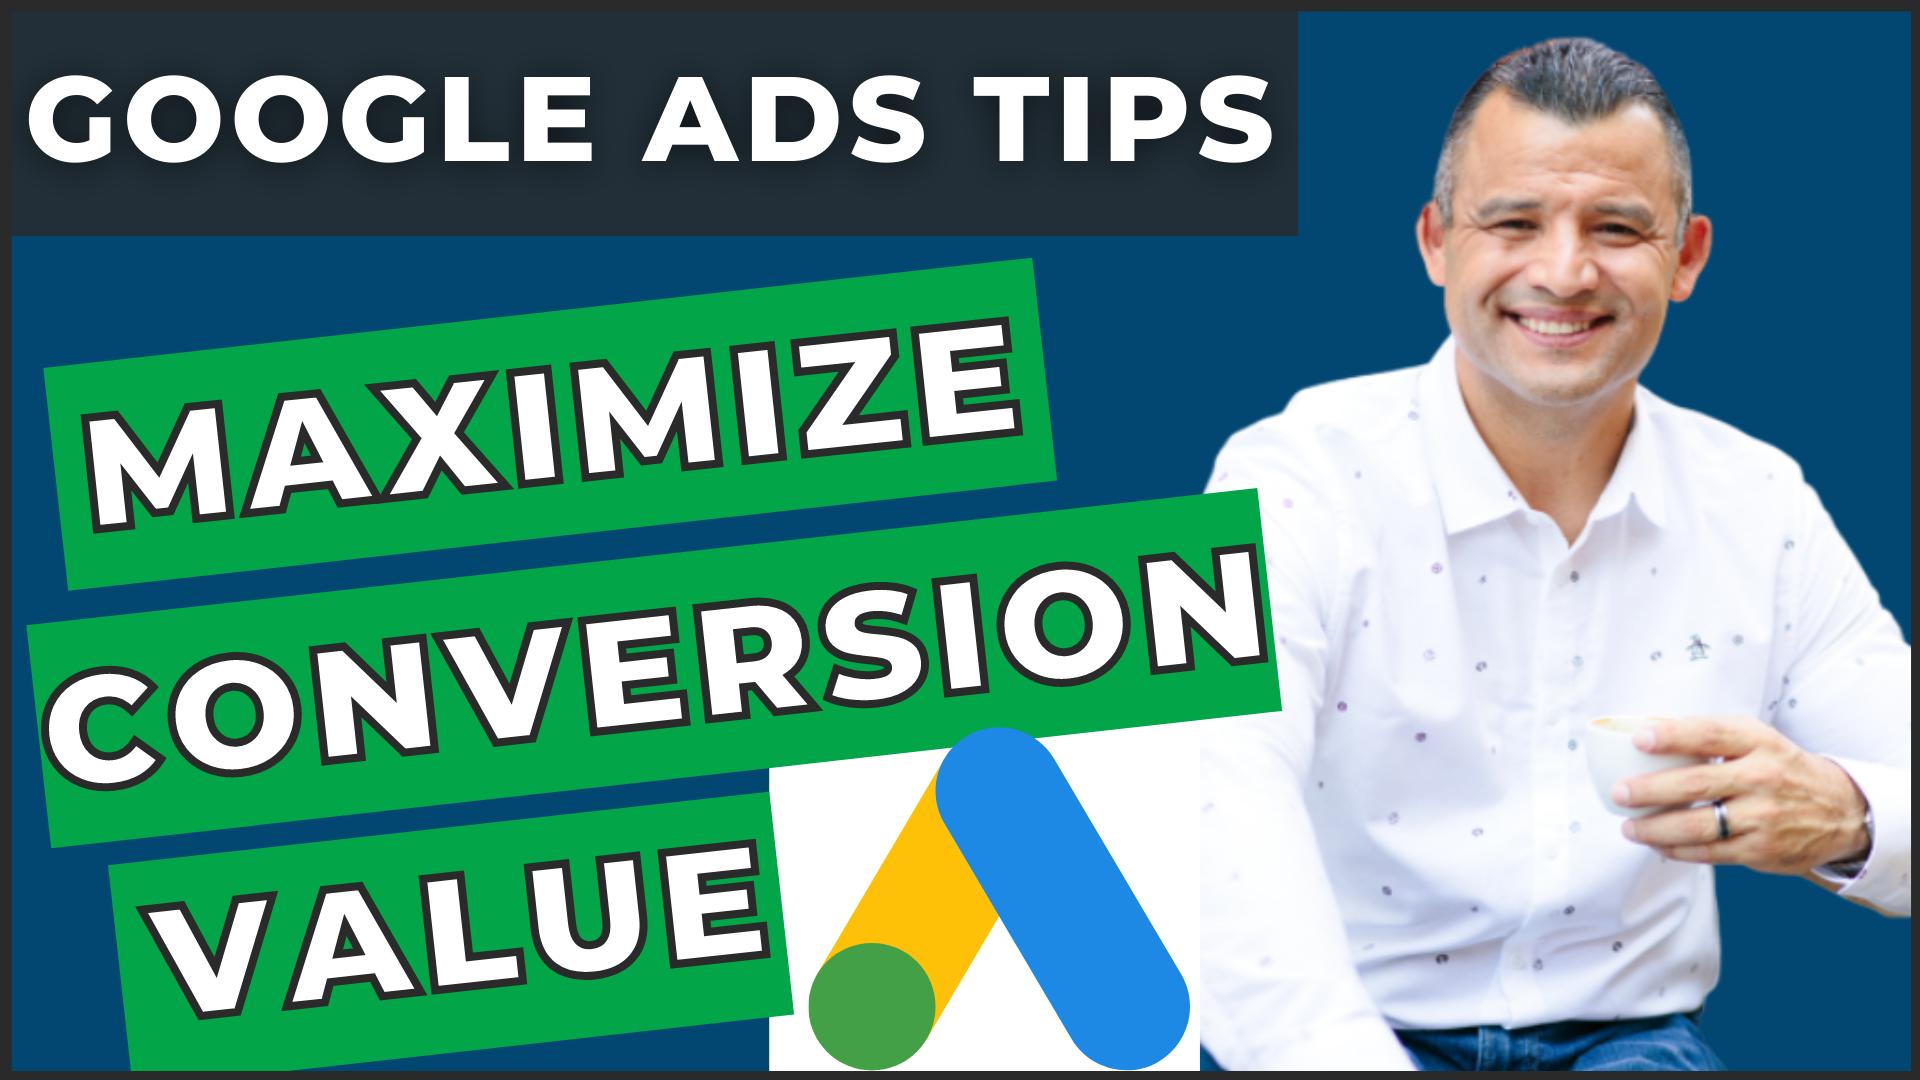 Maximize Conversion Value Secrets in Google Ads